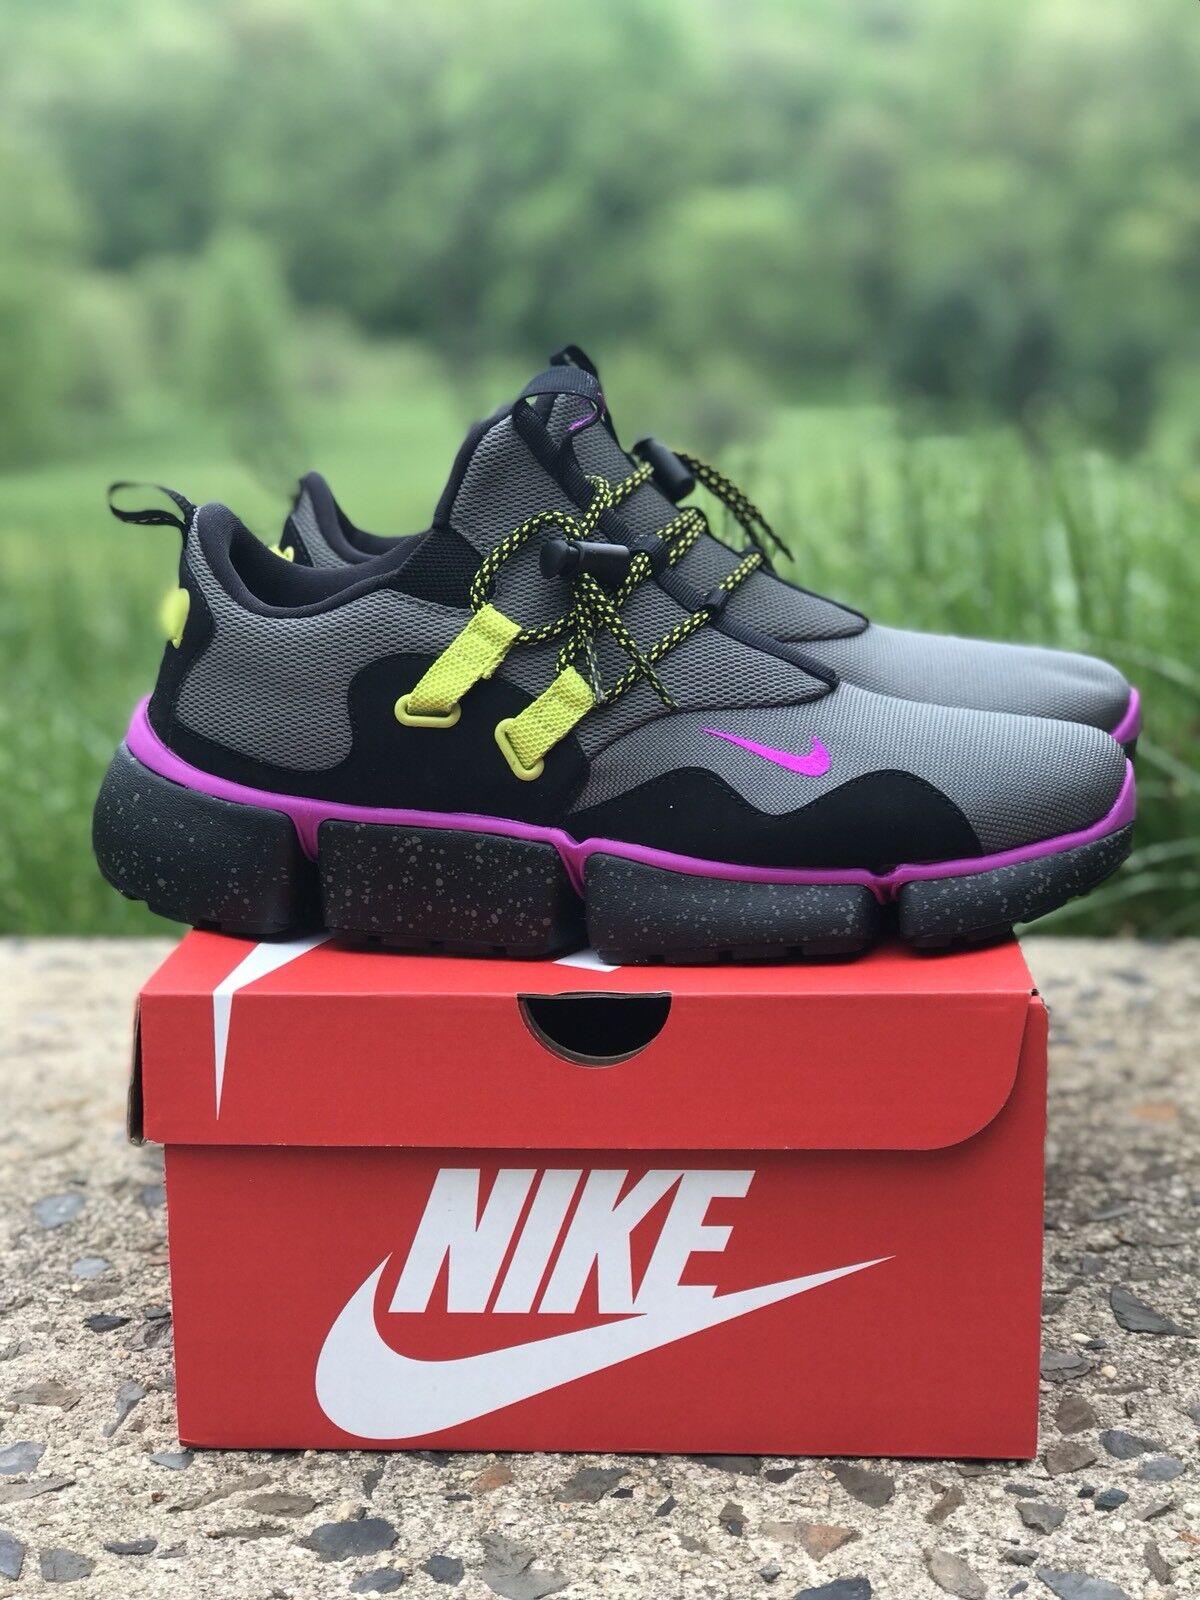 Nike coltellino dm su river rock violet nero ah9709 001 Uomo taglia &